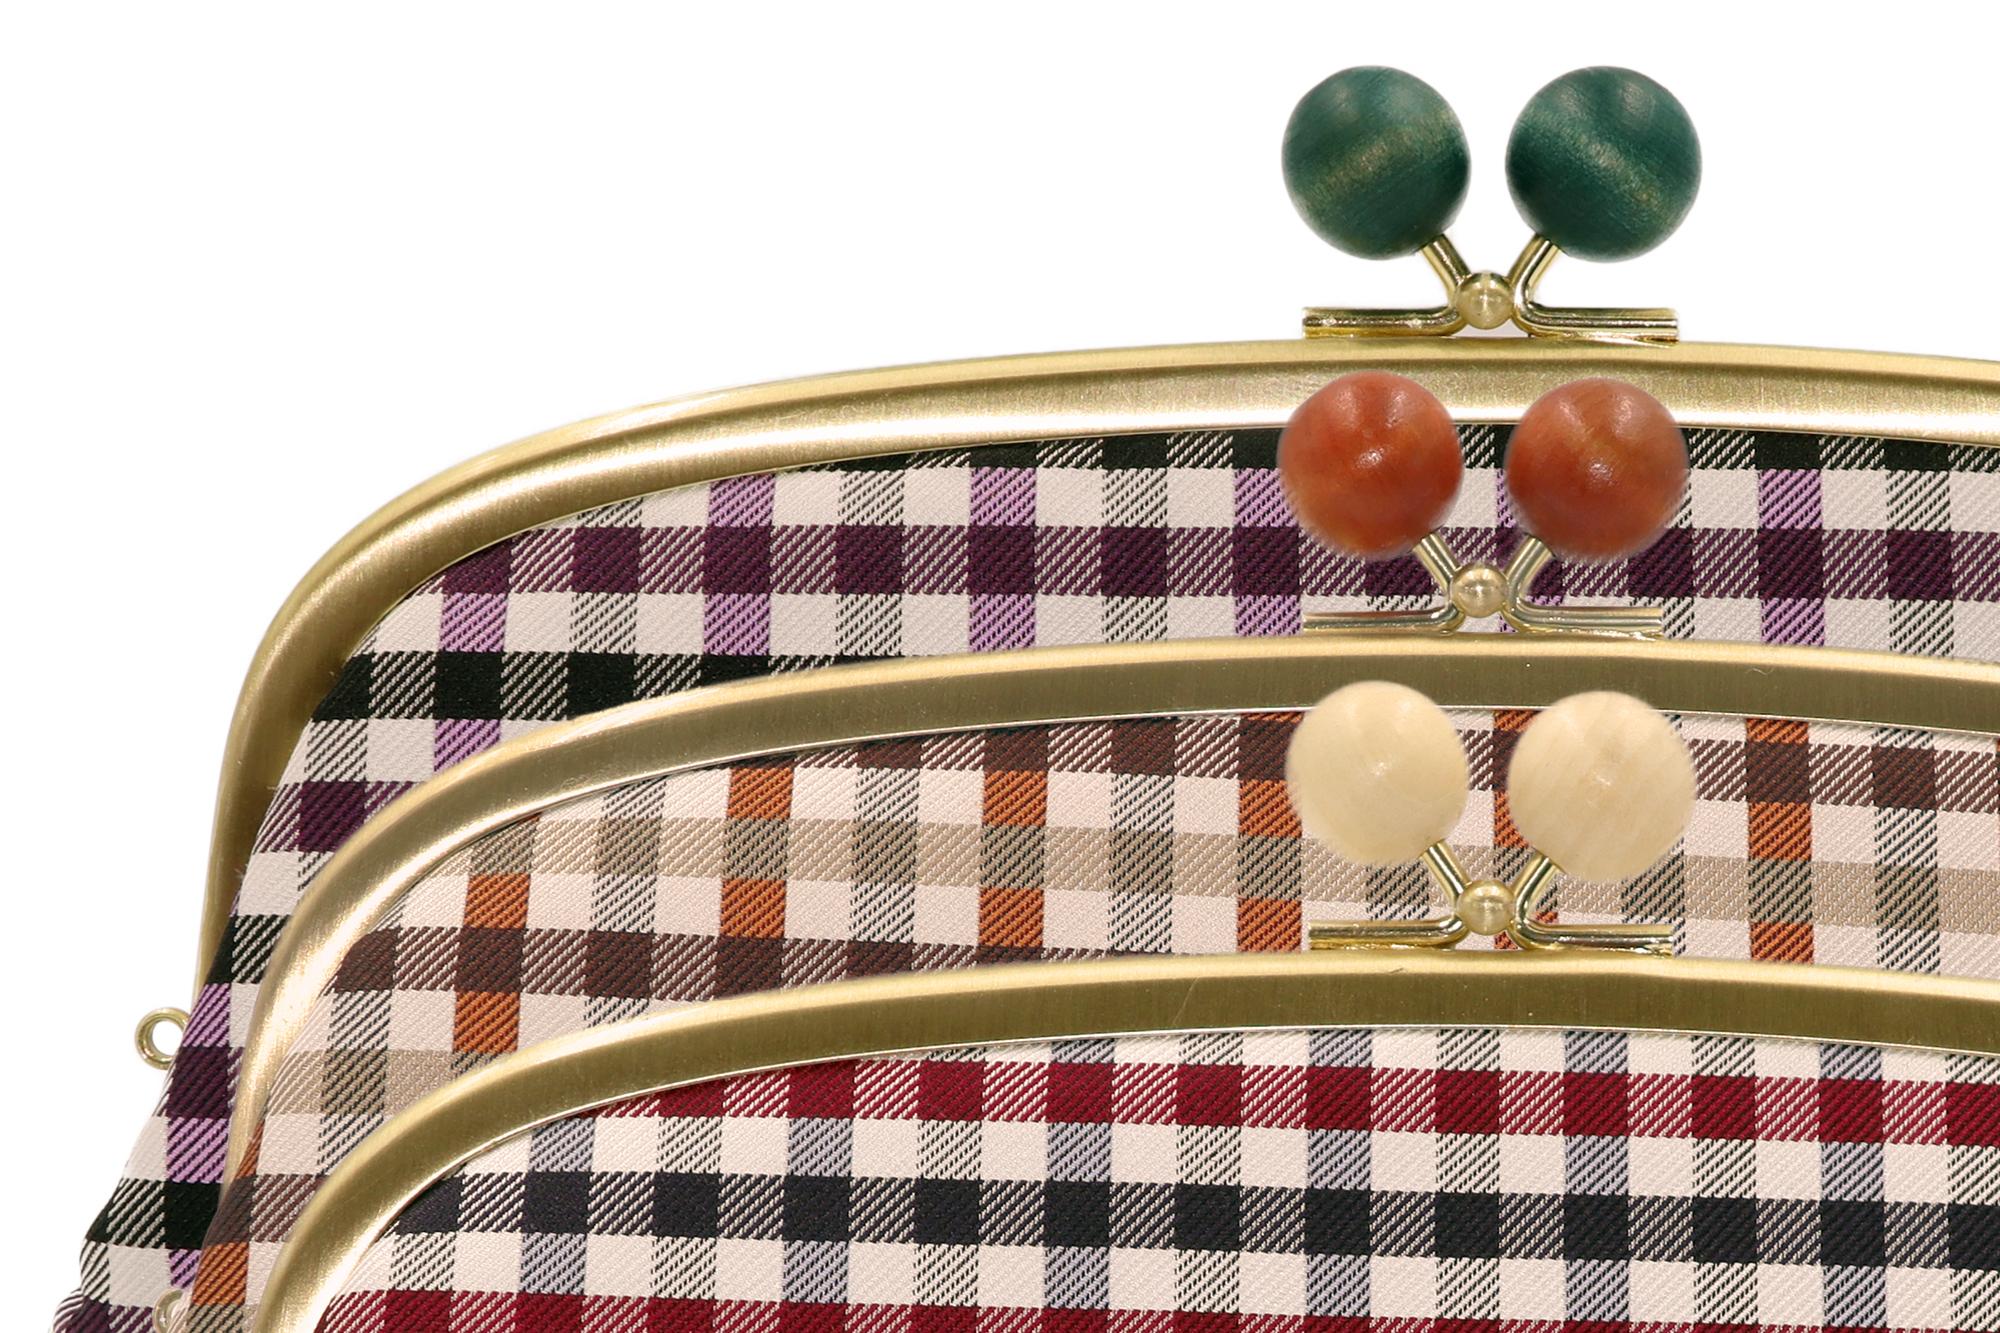 Atelier Kyoto Nishijin/西陣織シルク・がま口長財布・ギンガムチェック・ブラウン・日本製